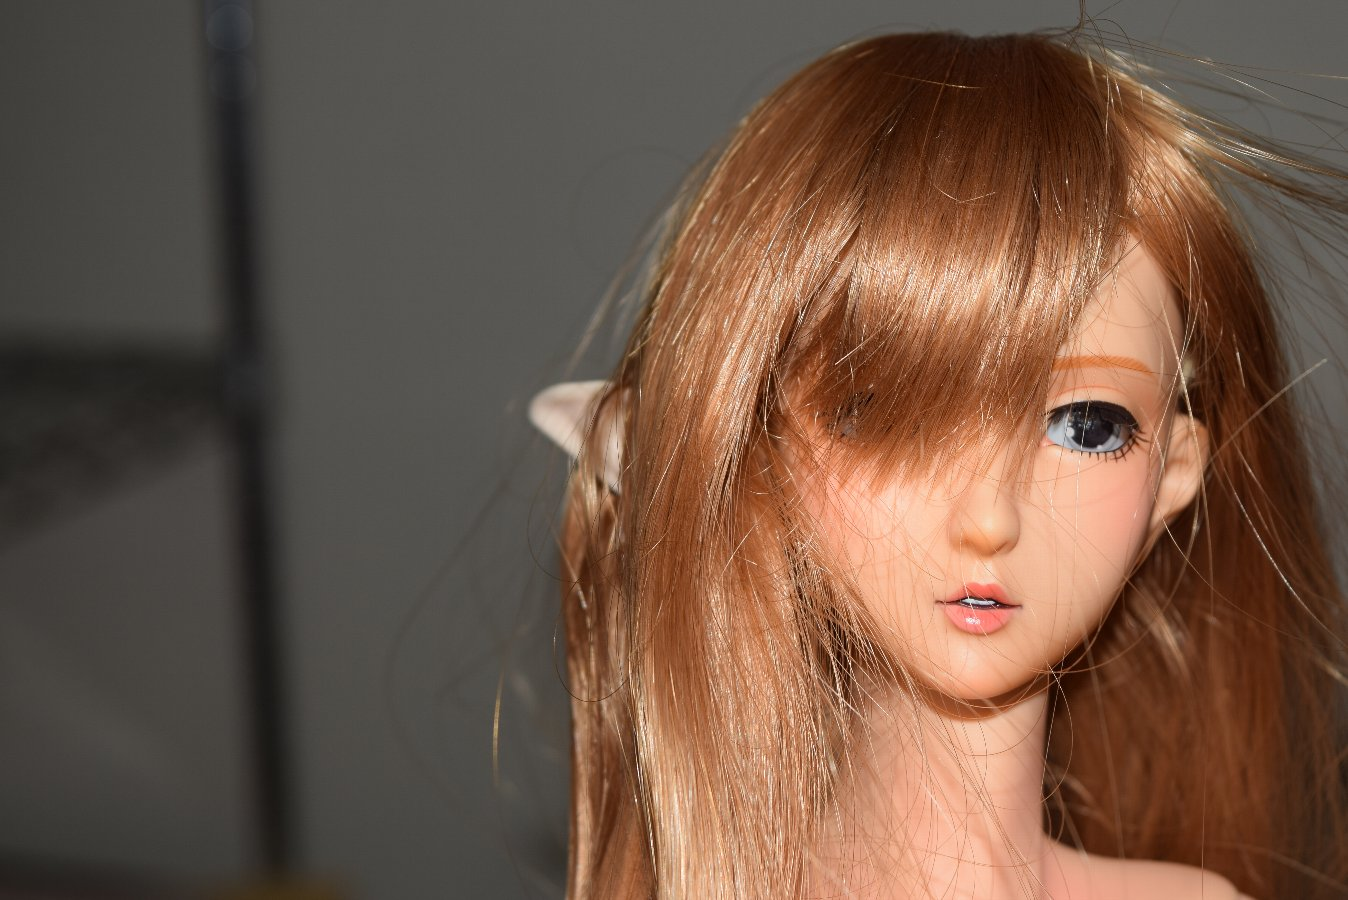 doll_012.jpg